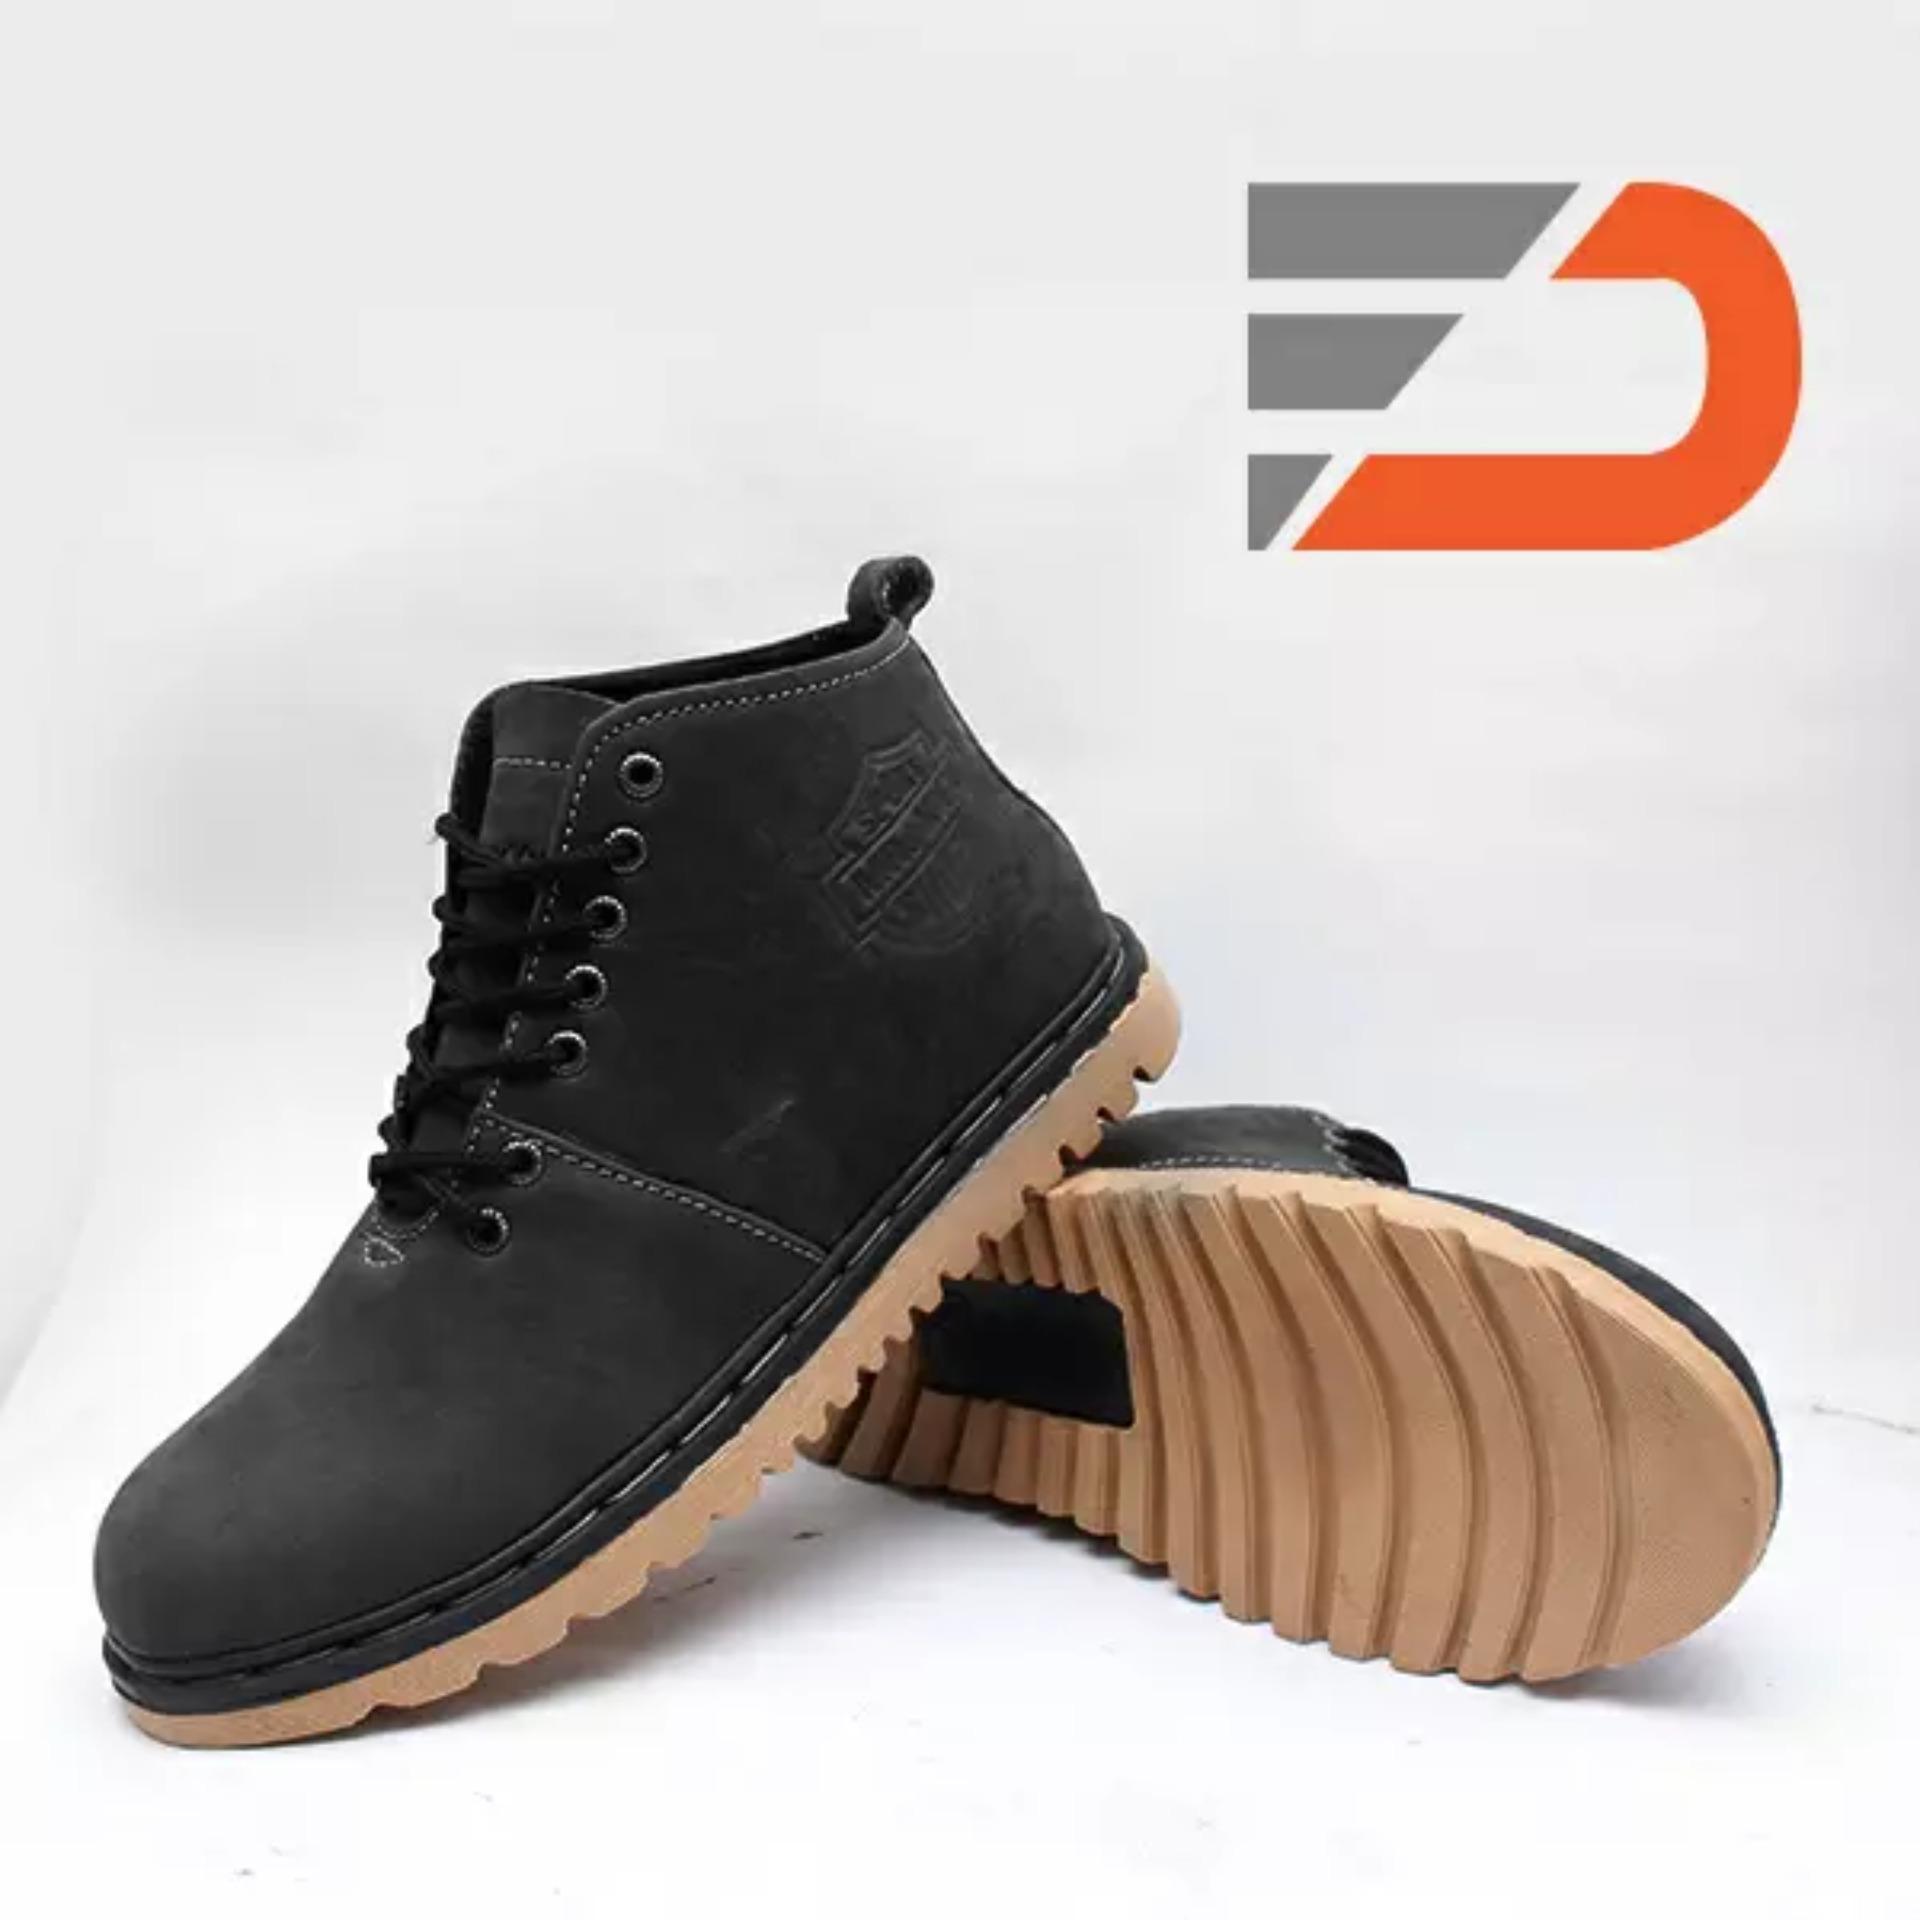 Spesifikasi Sepatu Casual Bahan Kulit Sapi Fdw 14